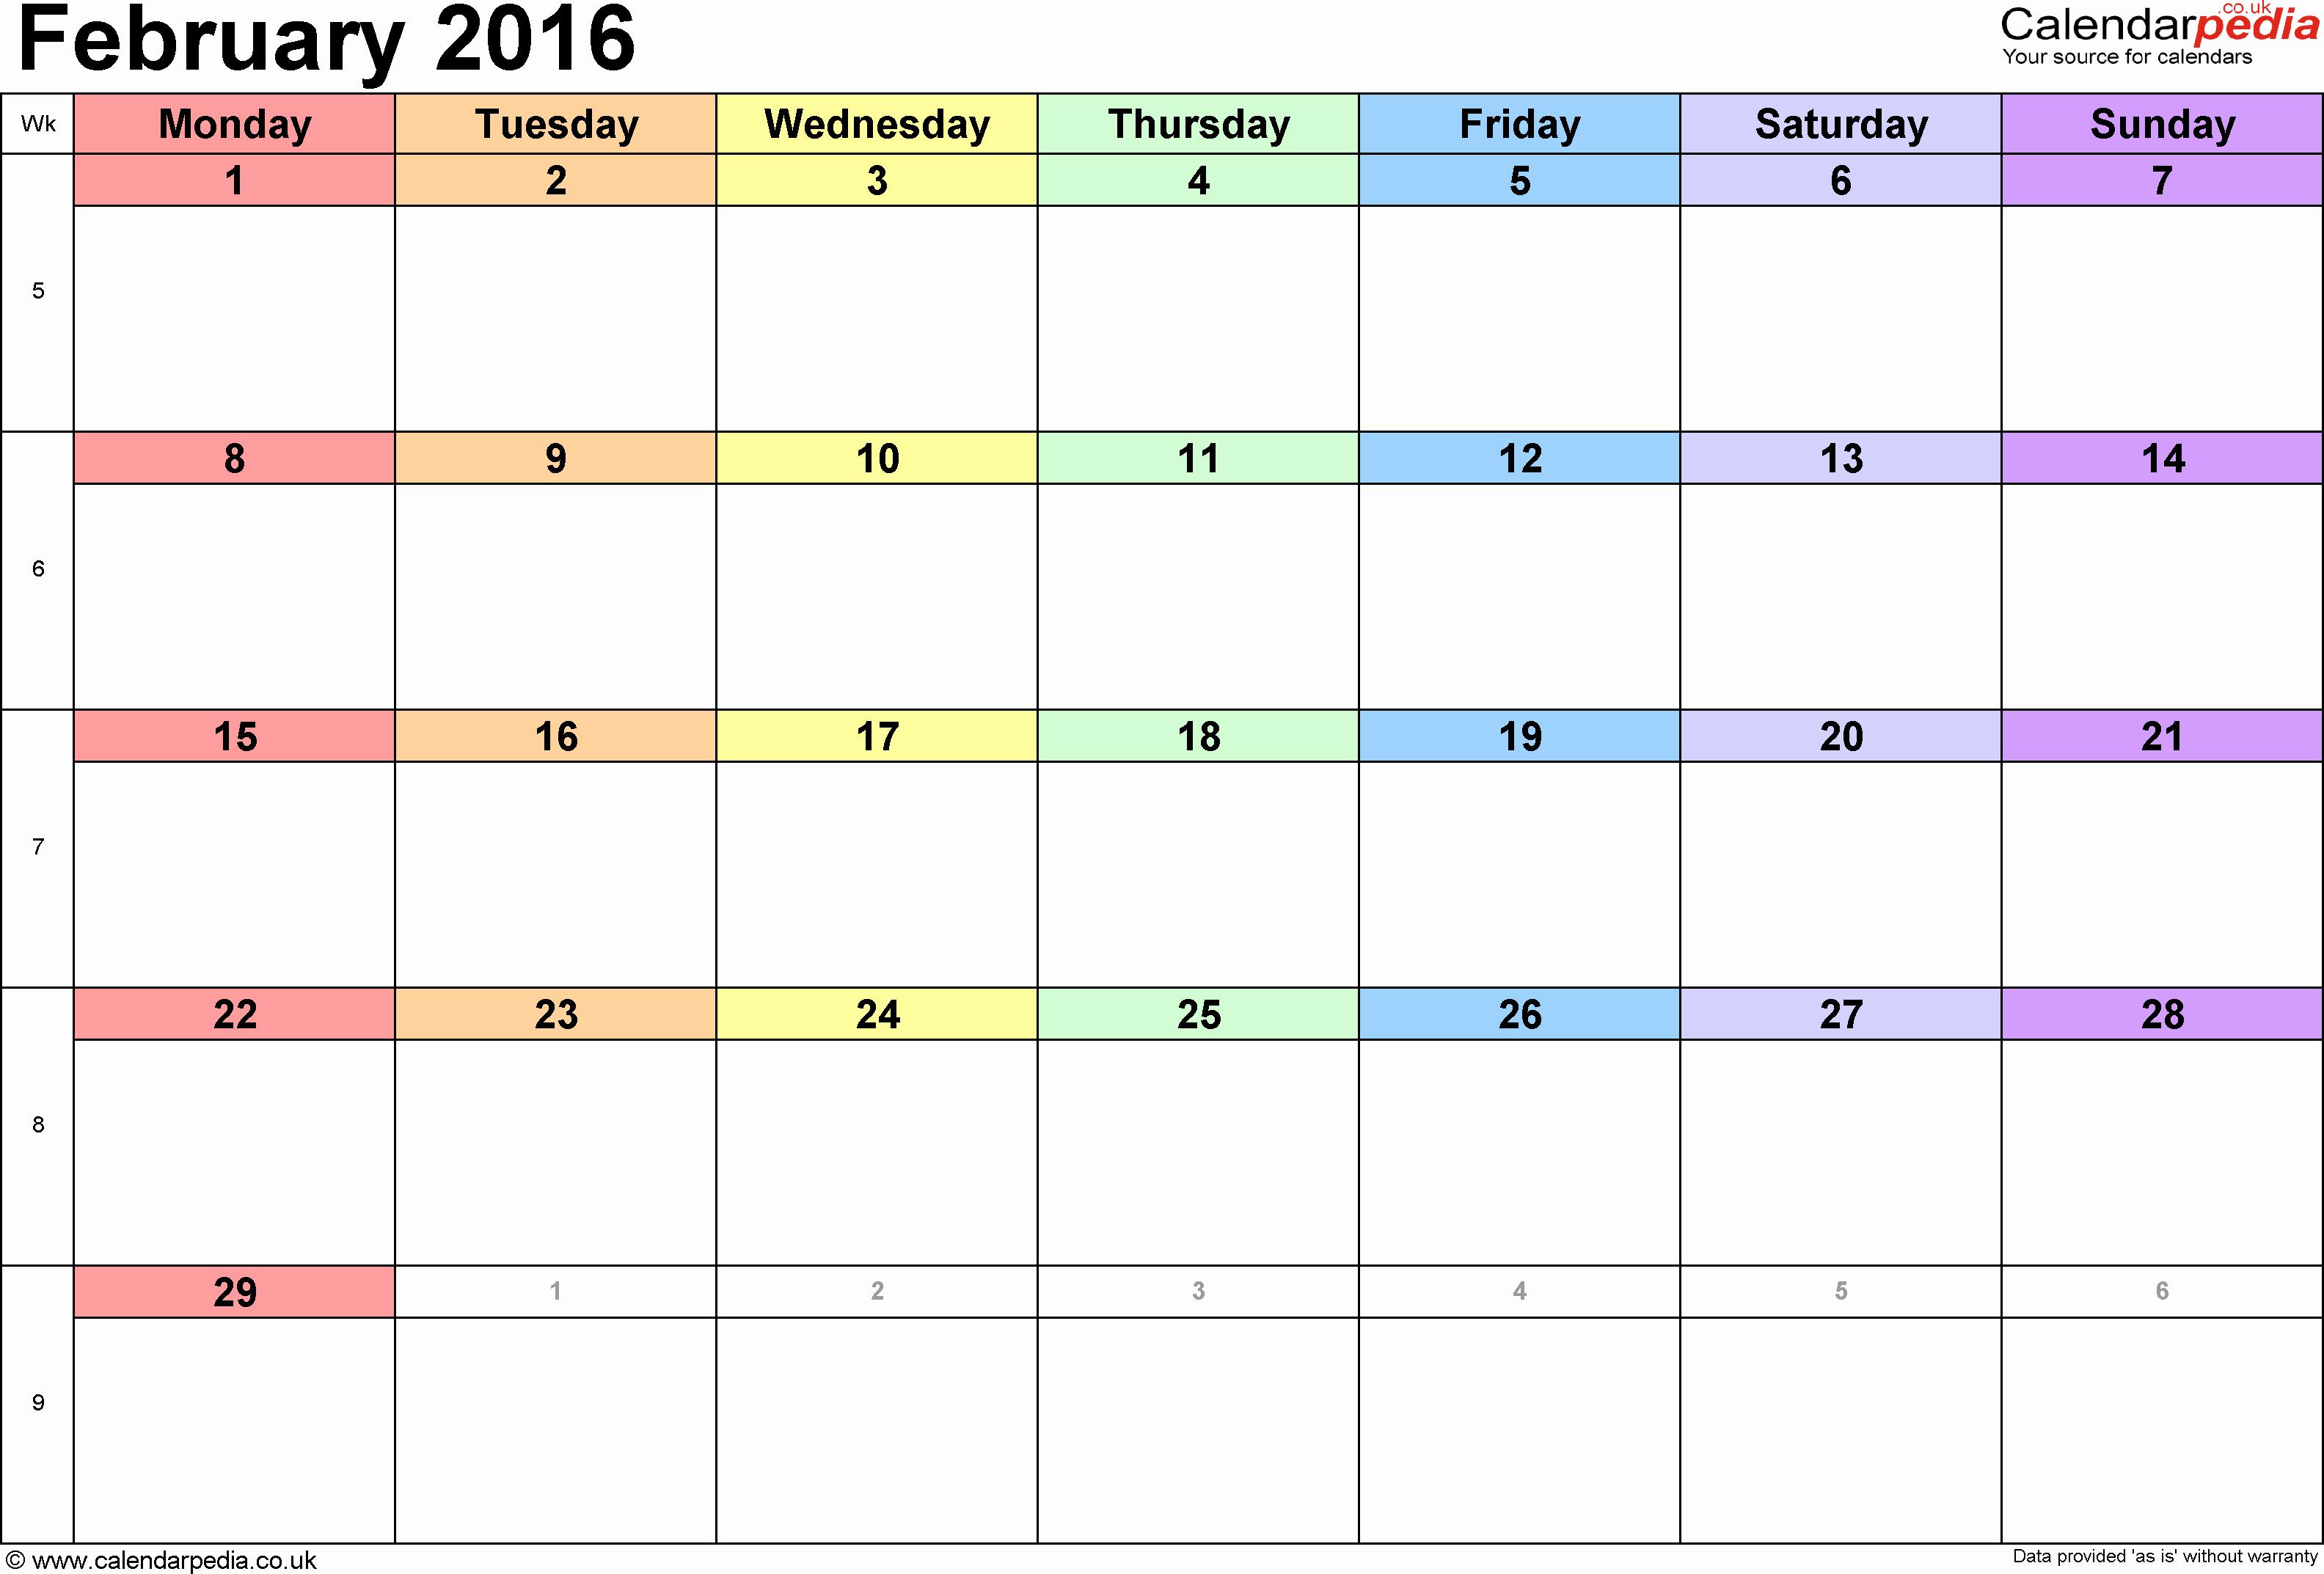 Excel 2016 Calendar with Holidays Beautiful Calendar February 2016 Uk Bank Holidays Excel Pdf Word